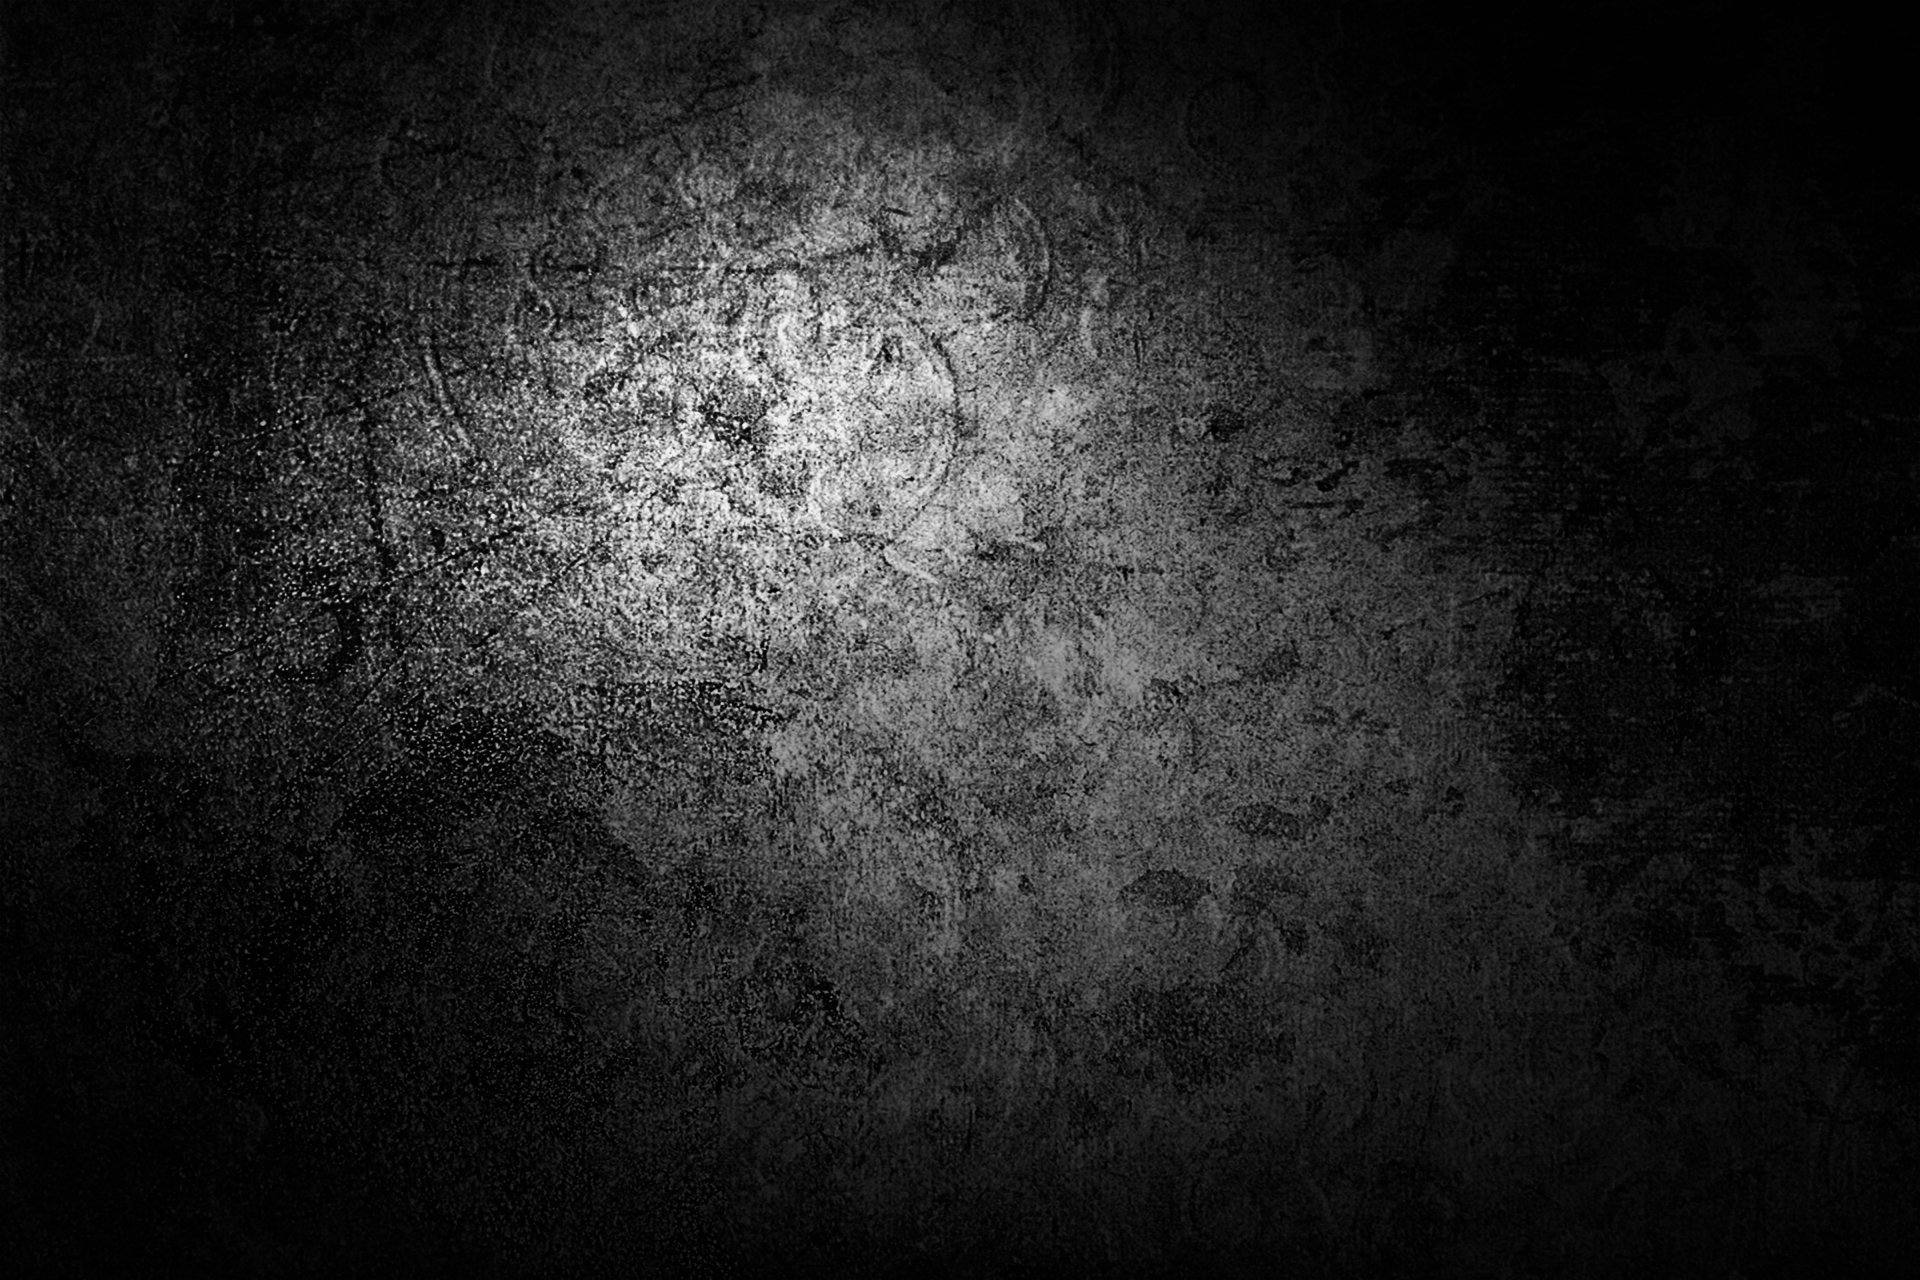 Texture 4k Ultra Fond d'écran HD | Arrière-Plan | 4800x3200 | ID:774122 - Wallpaper Abyss